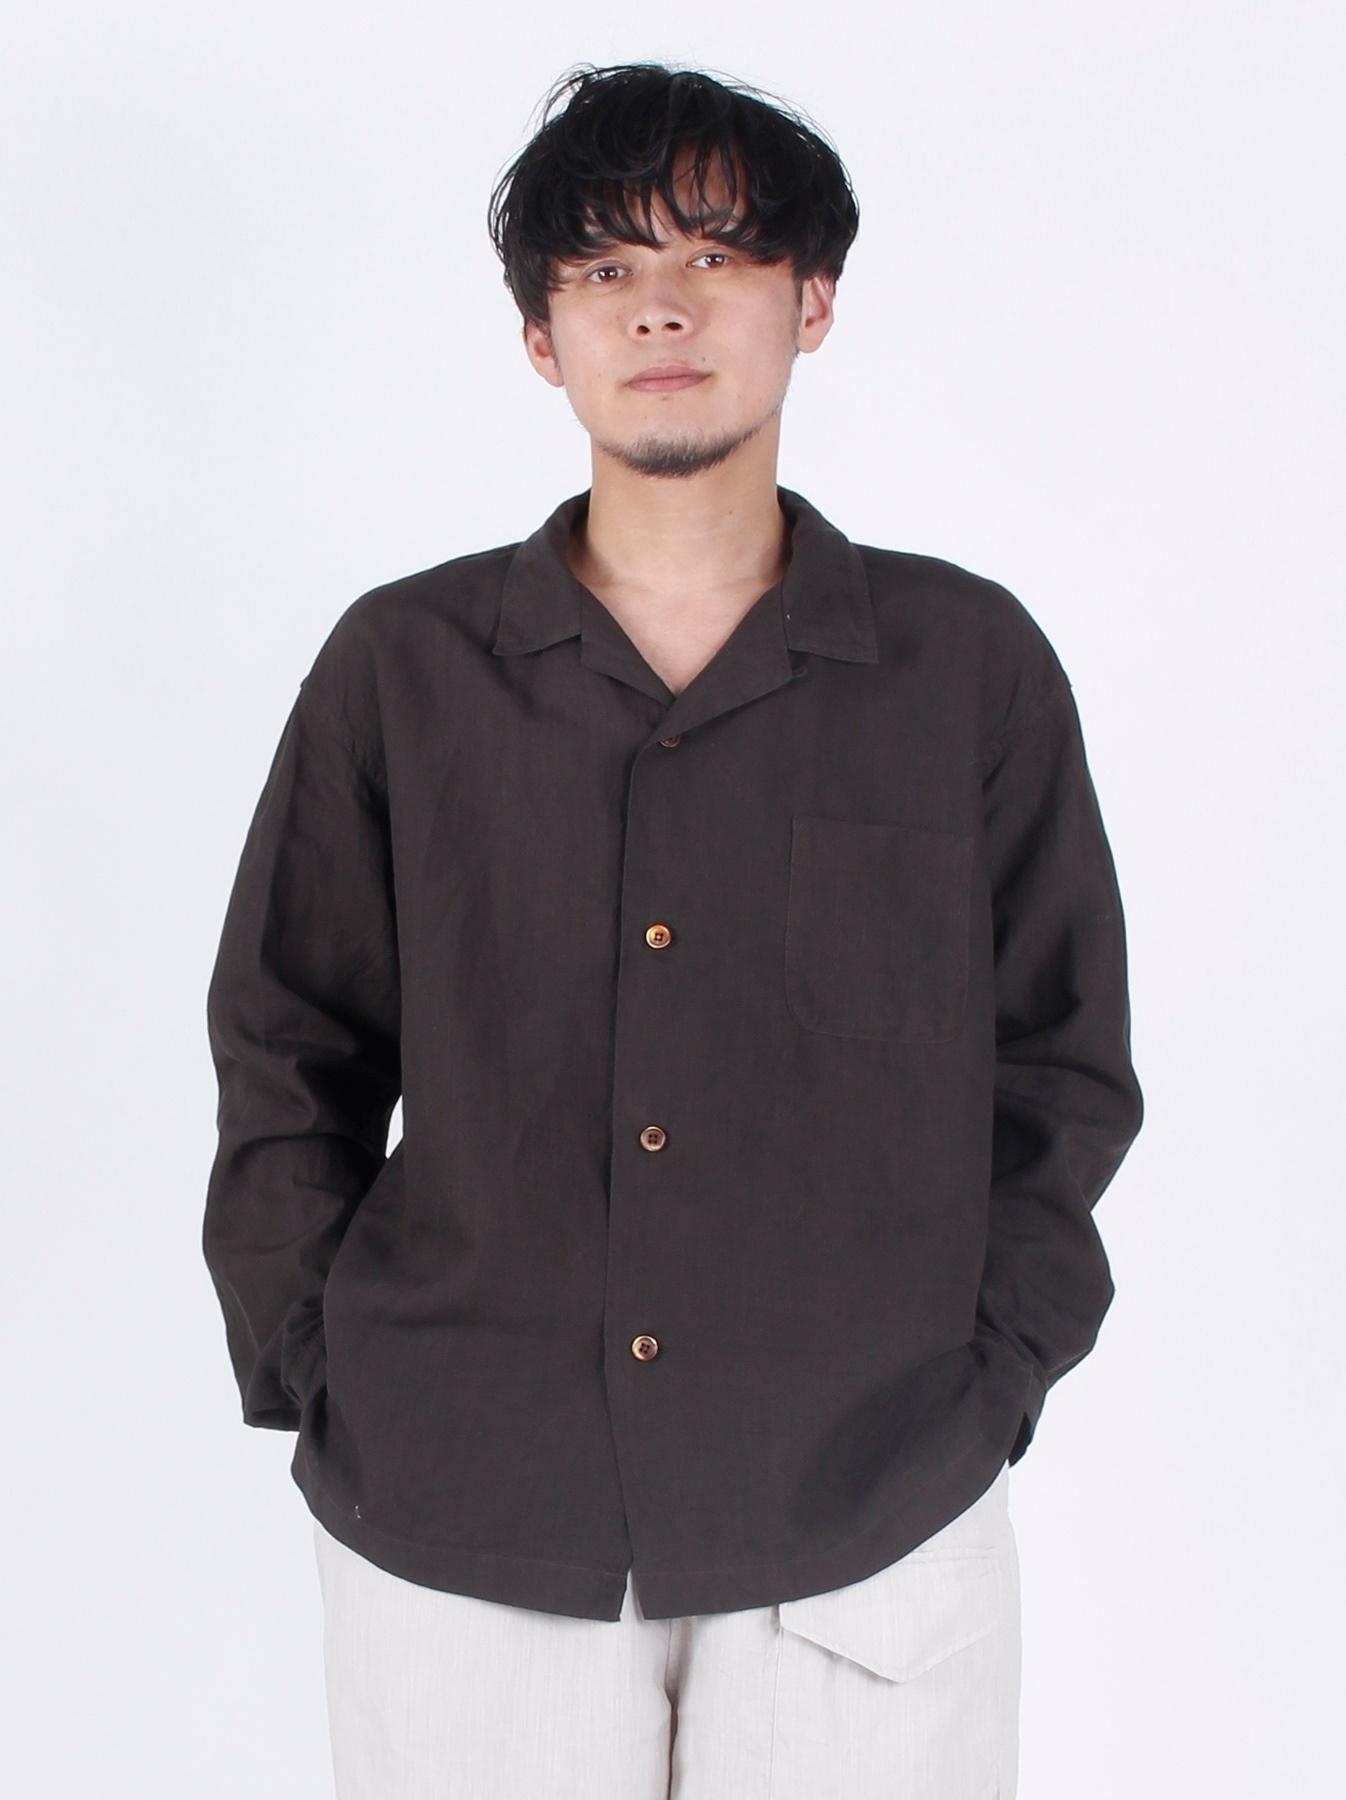 WH Piece-dyed Linen 908 Safari Shirt-5